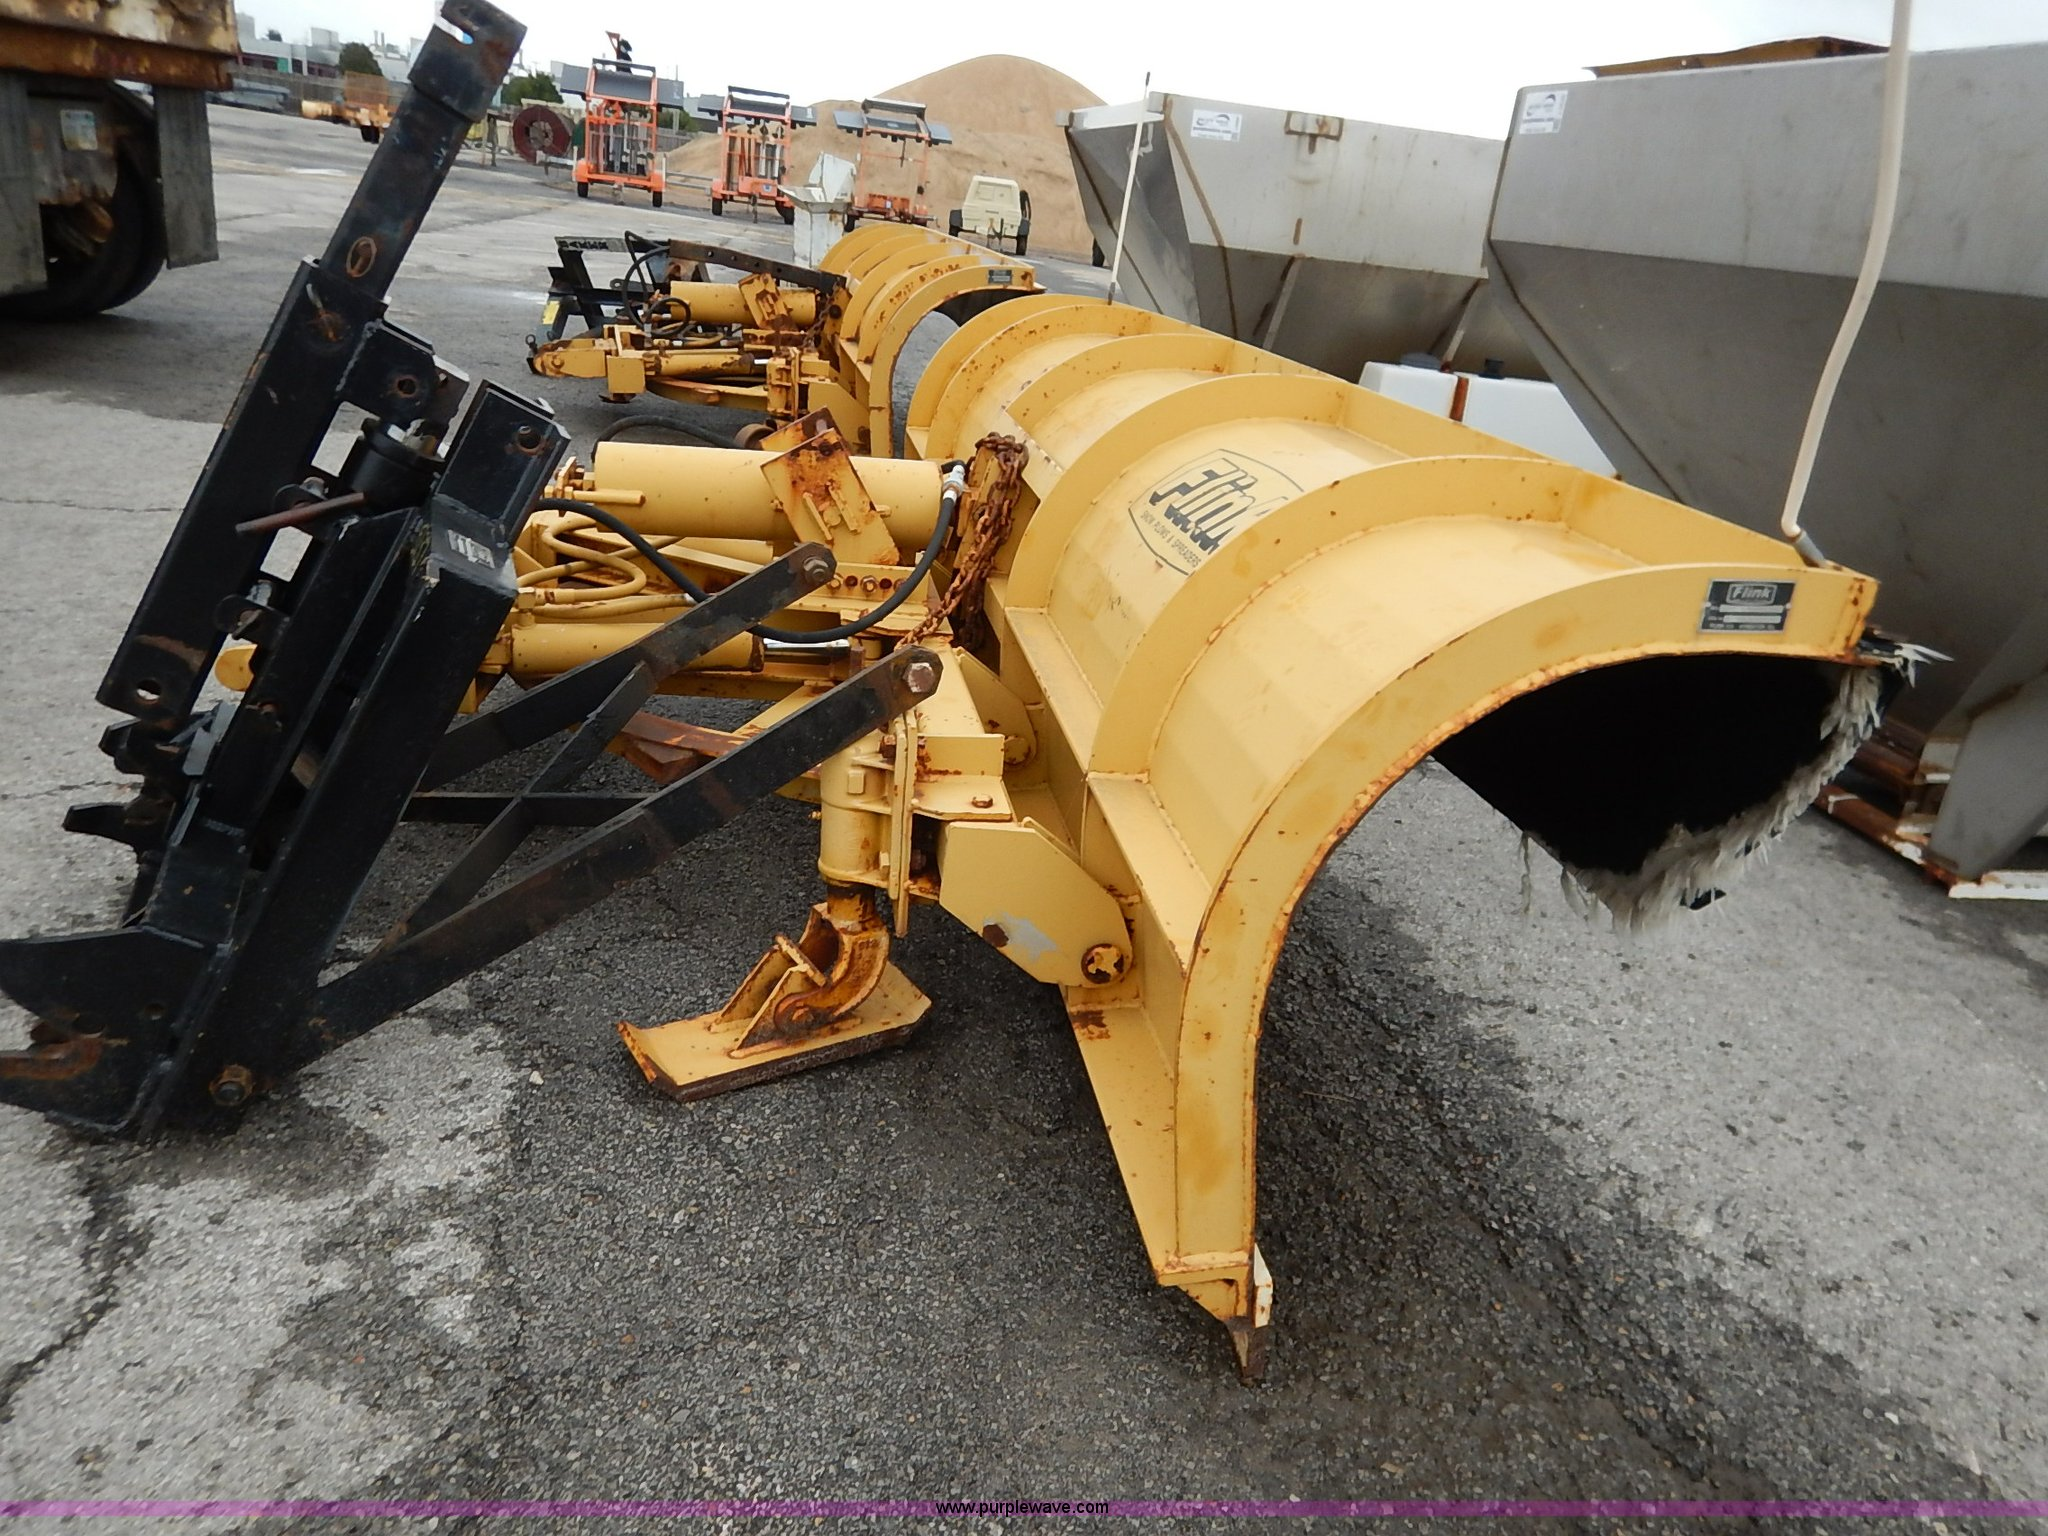 Flink Snow Plow Parts Diagram Trusted Wiring Diagrams 11pa38 Ks Item J3633 Sold October 14 Ka Boss